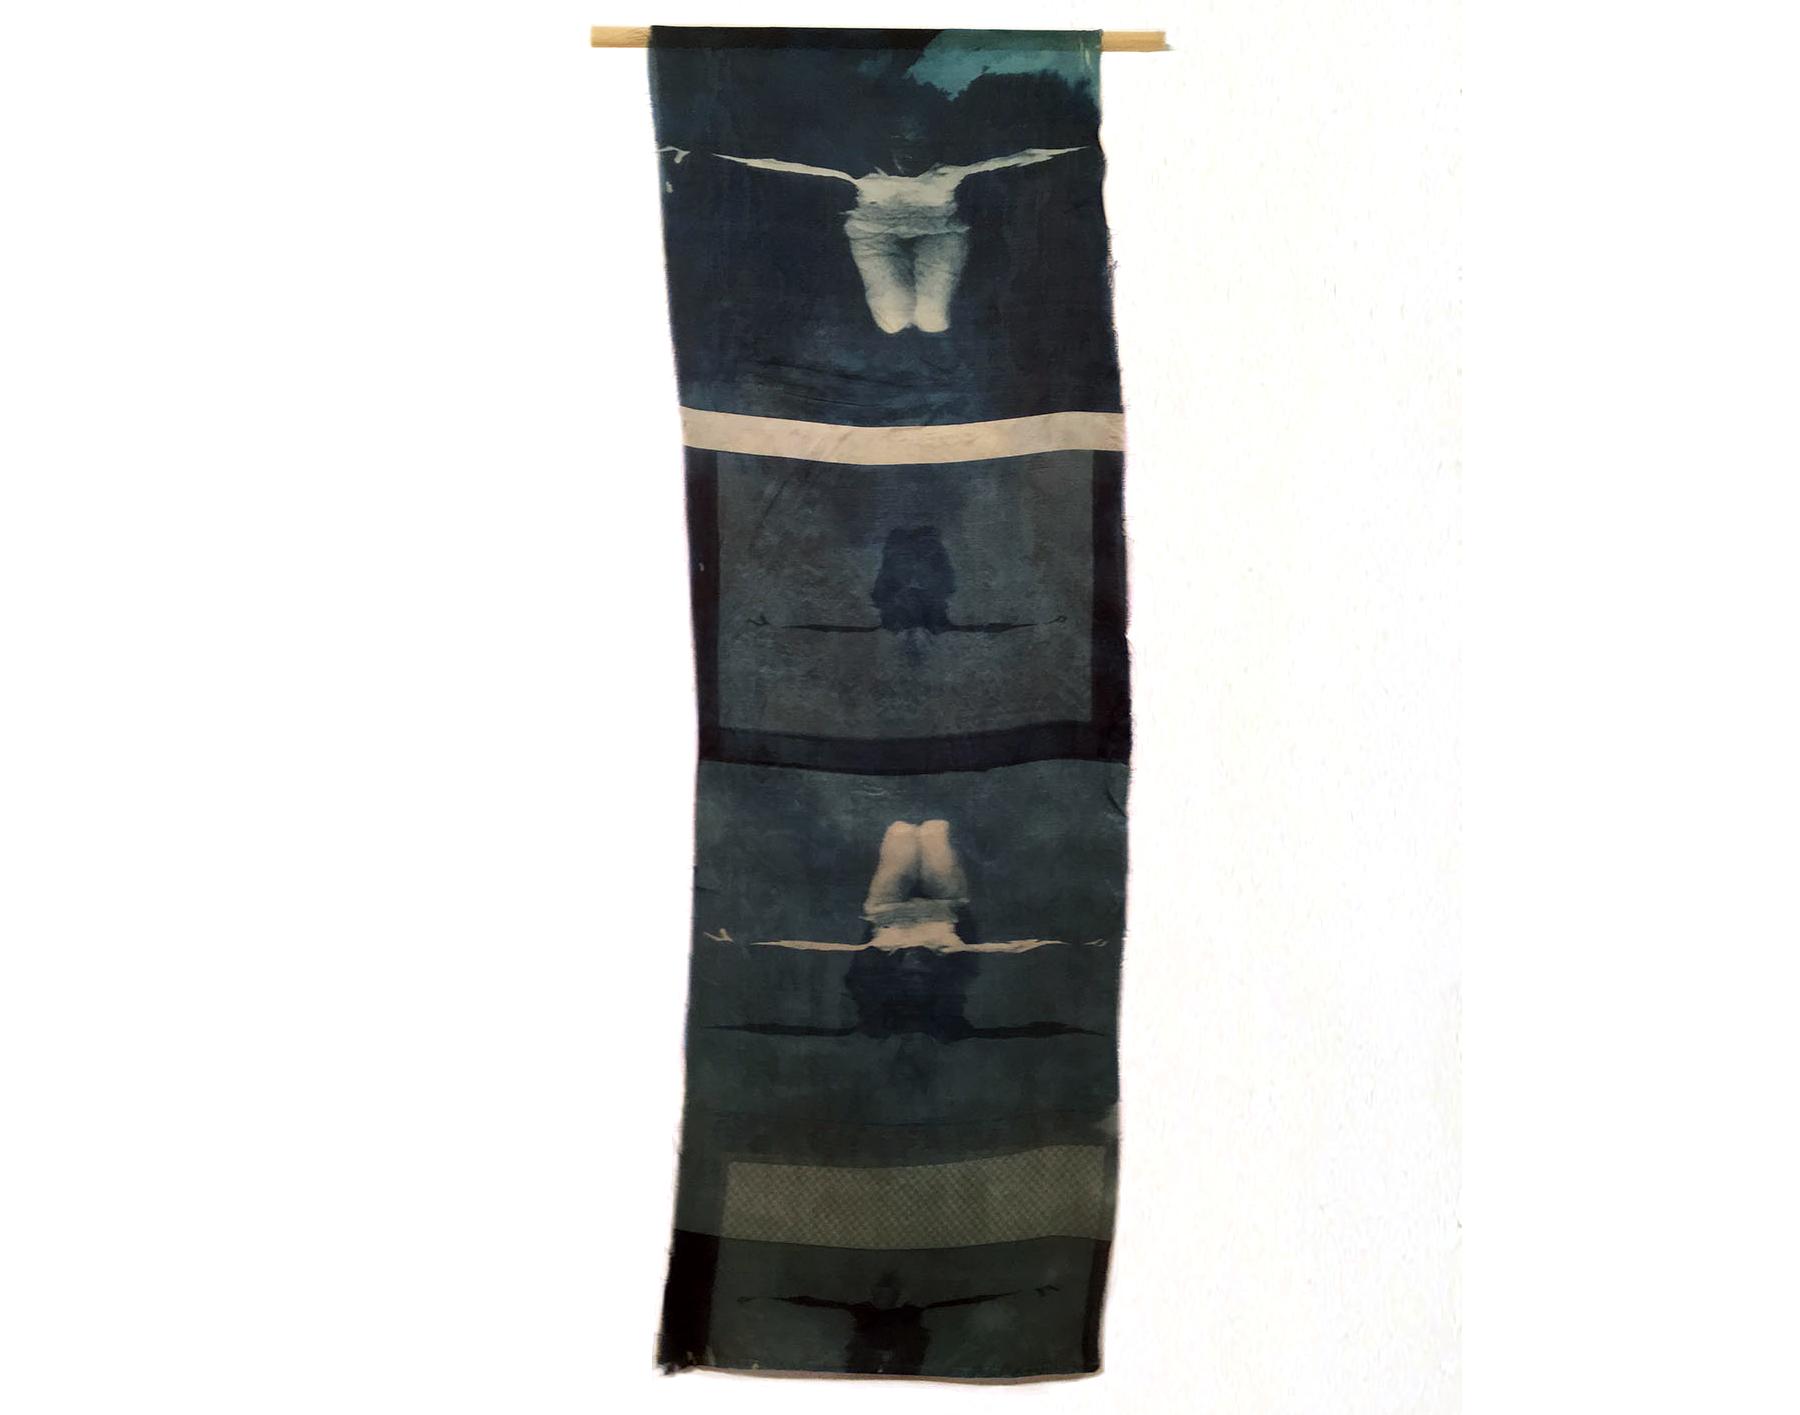 Woman/Water I, 1996, Cyanotype on Silk, 12 x 35